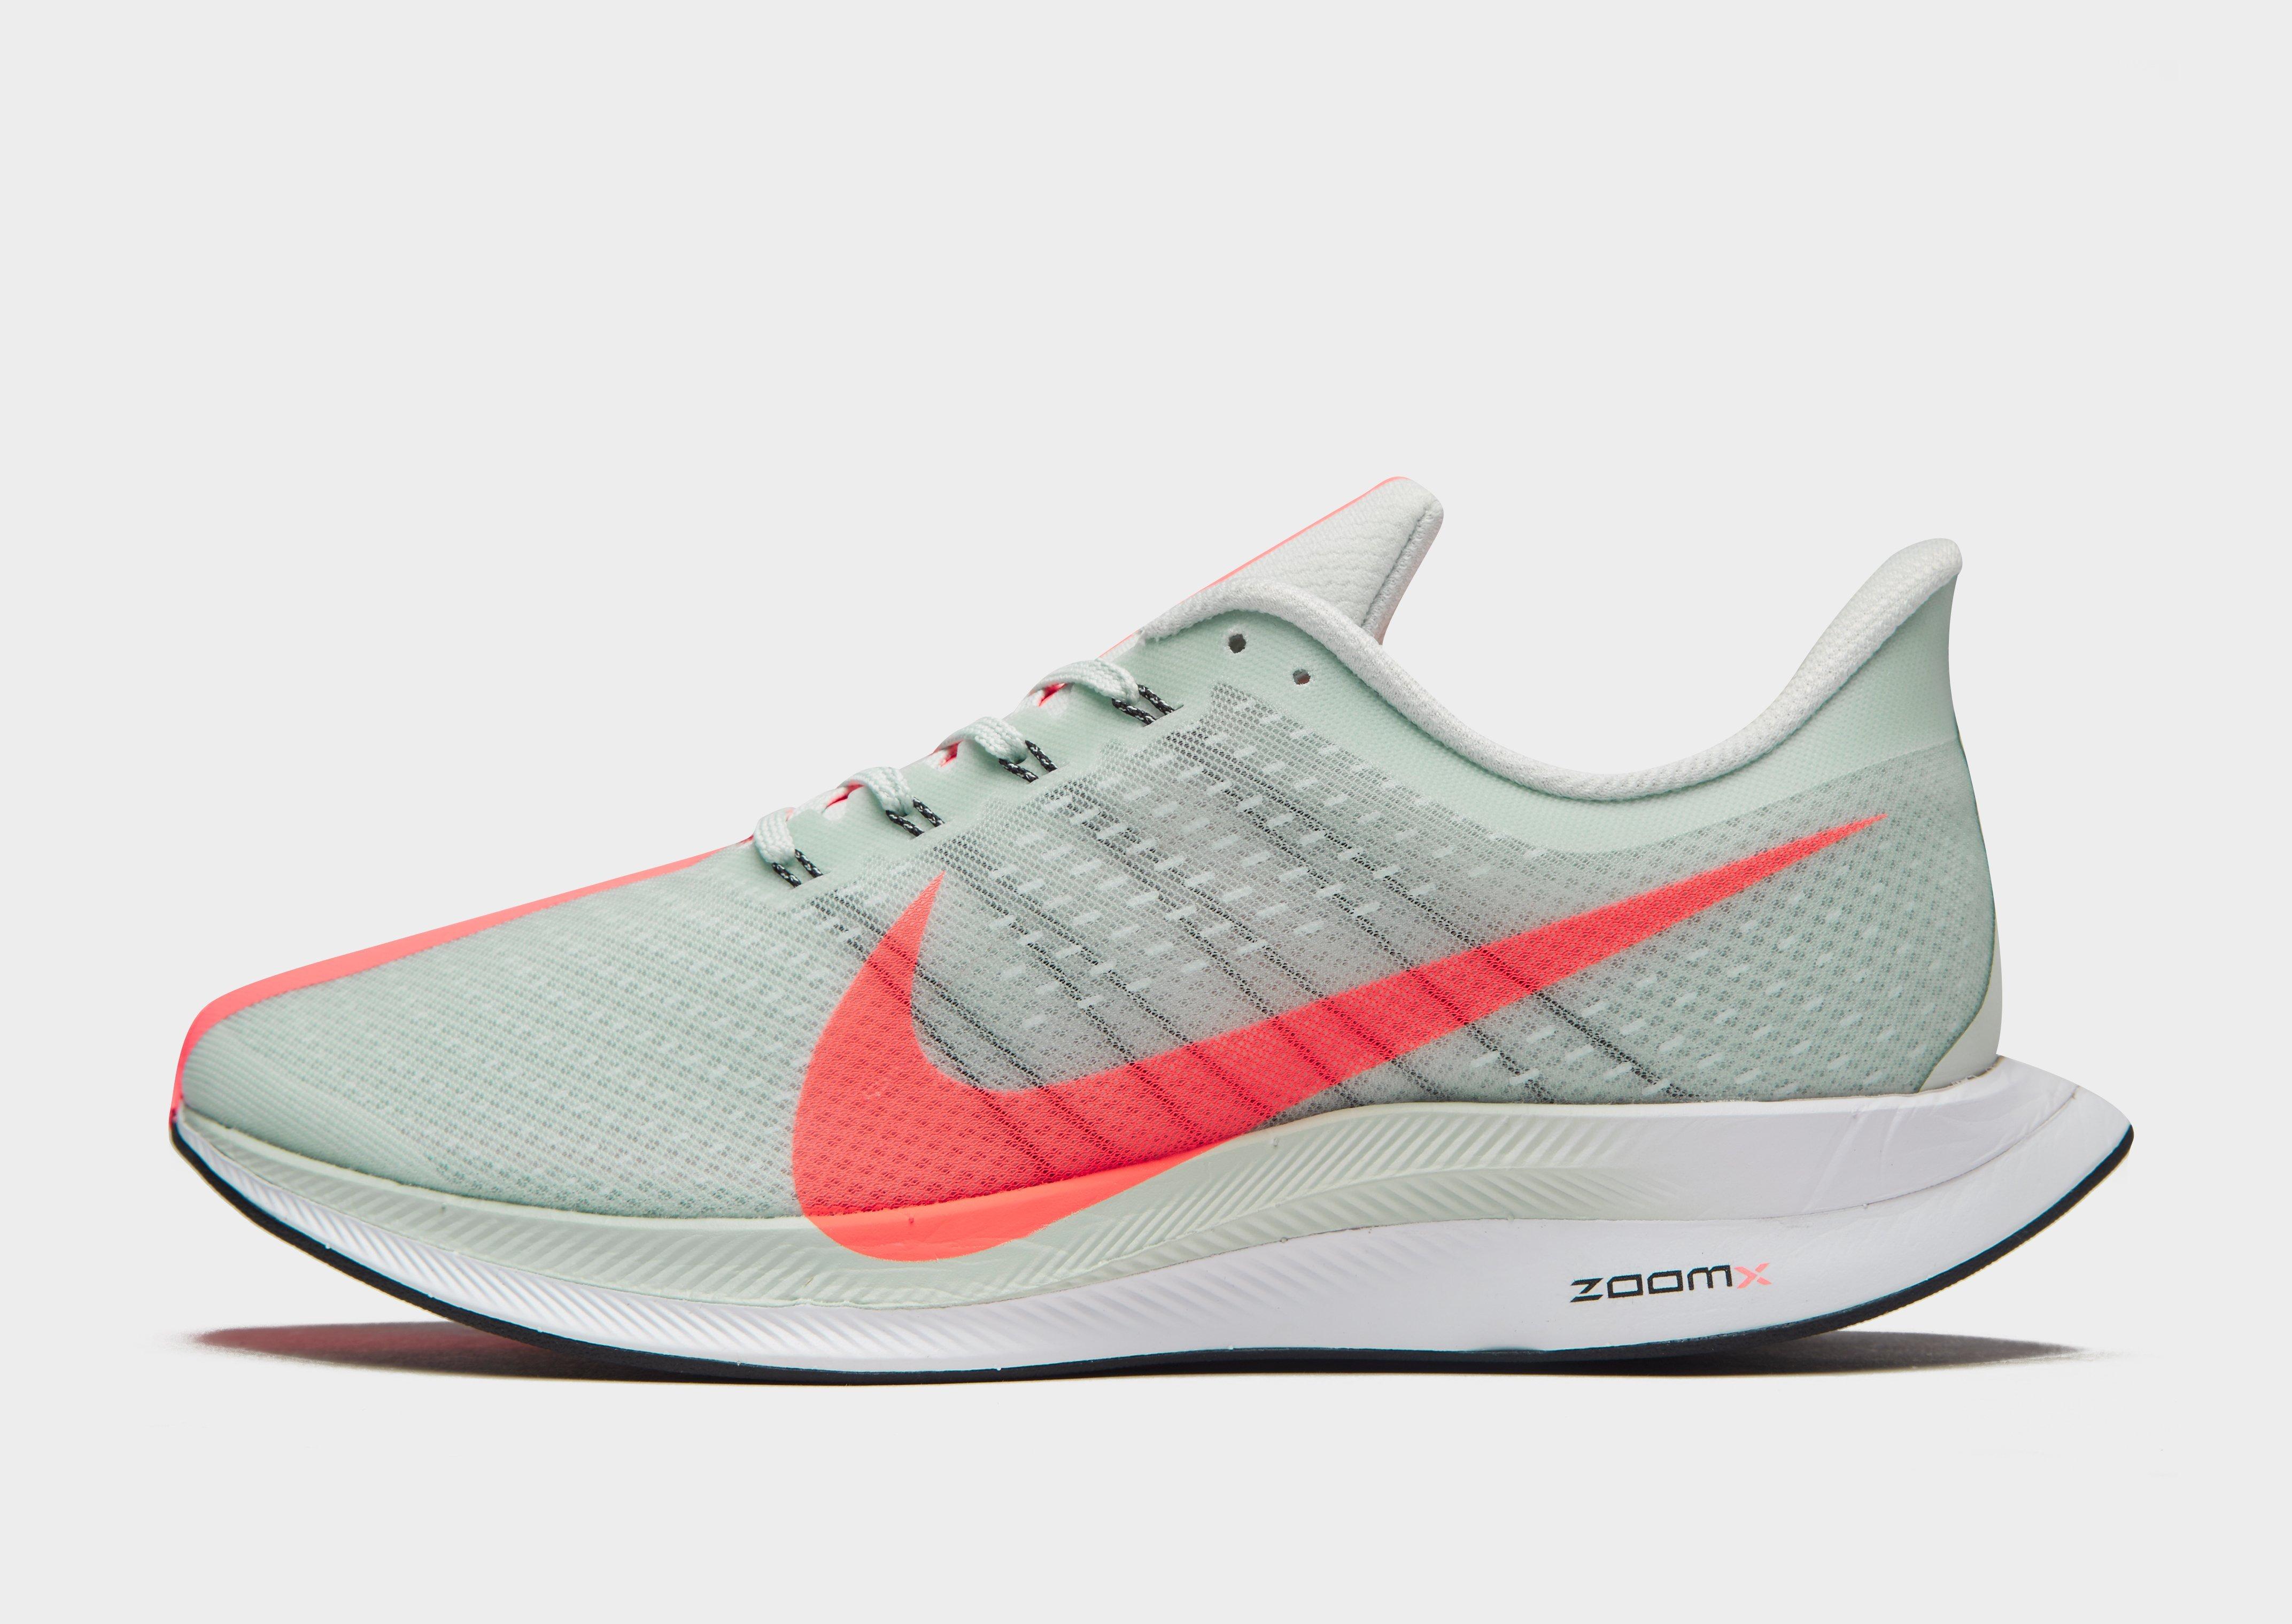 Nike ZOOMX PEGASUS TURBO vs. adidas ULTRA BOOST!!